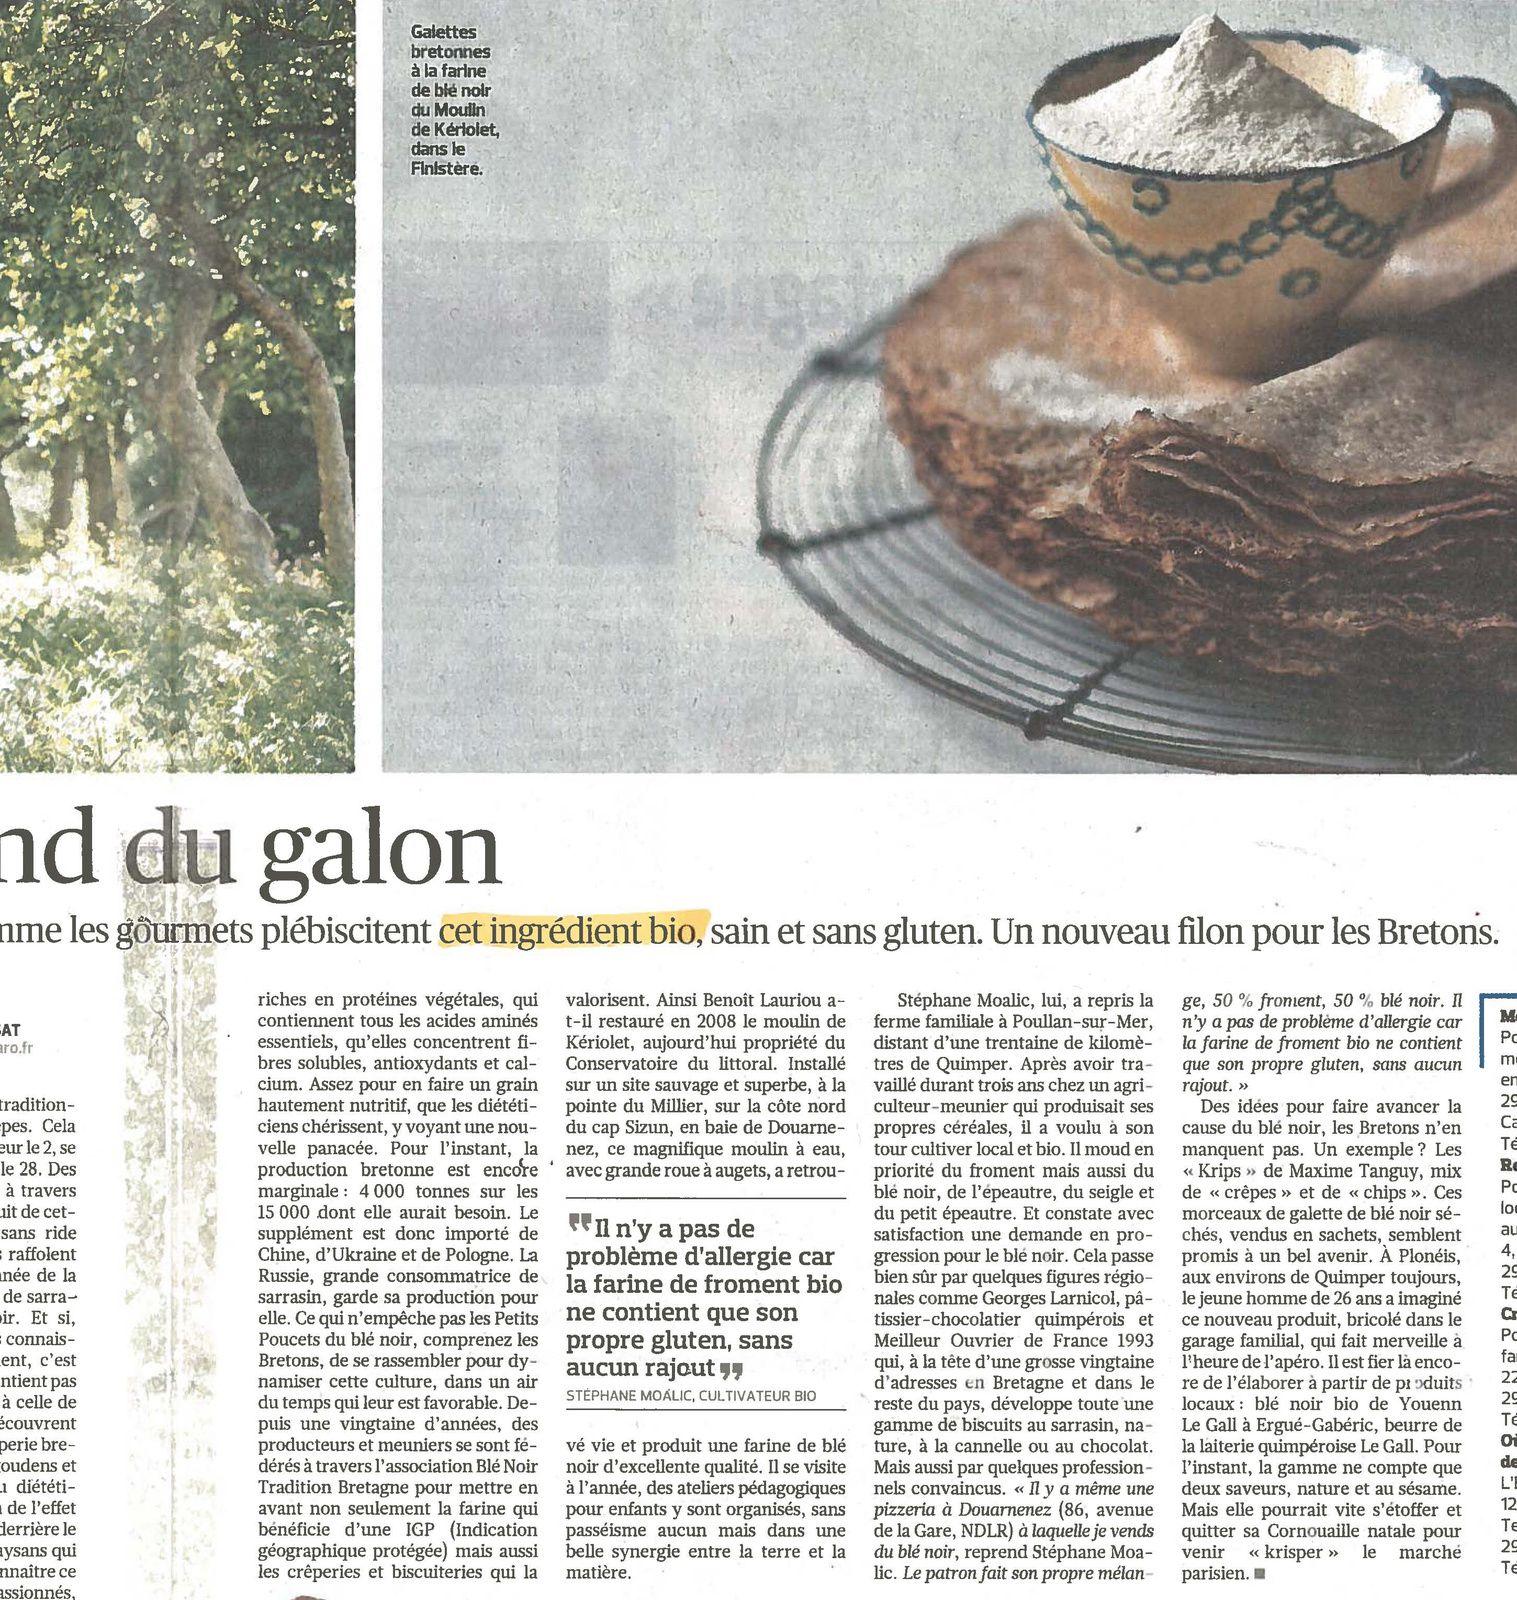 Crêpes, galettes... vu dans Le Figaro du samedi 28 janvier